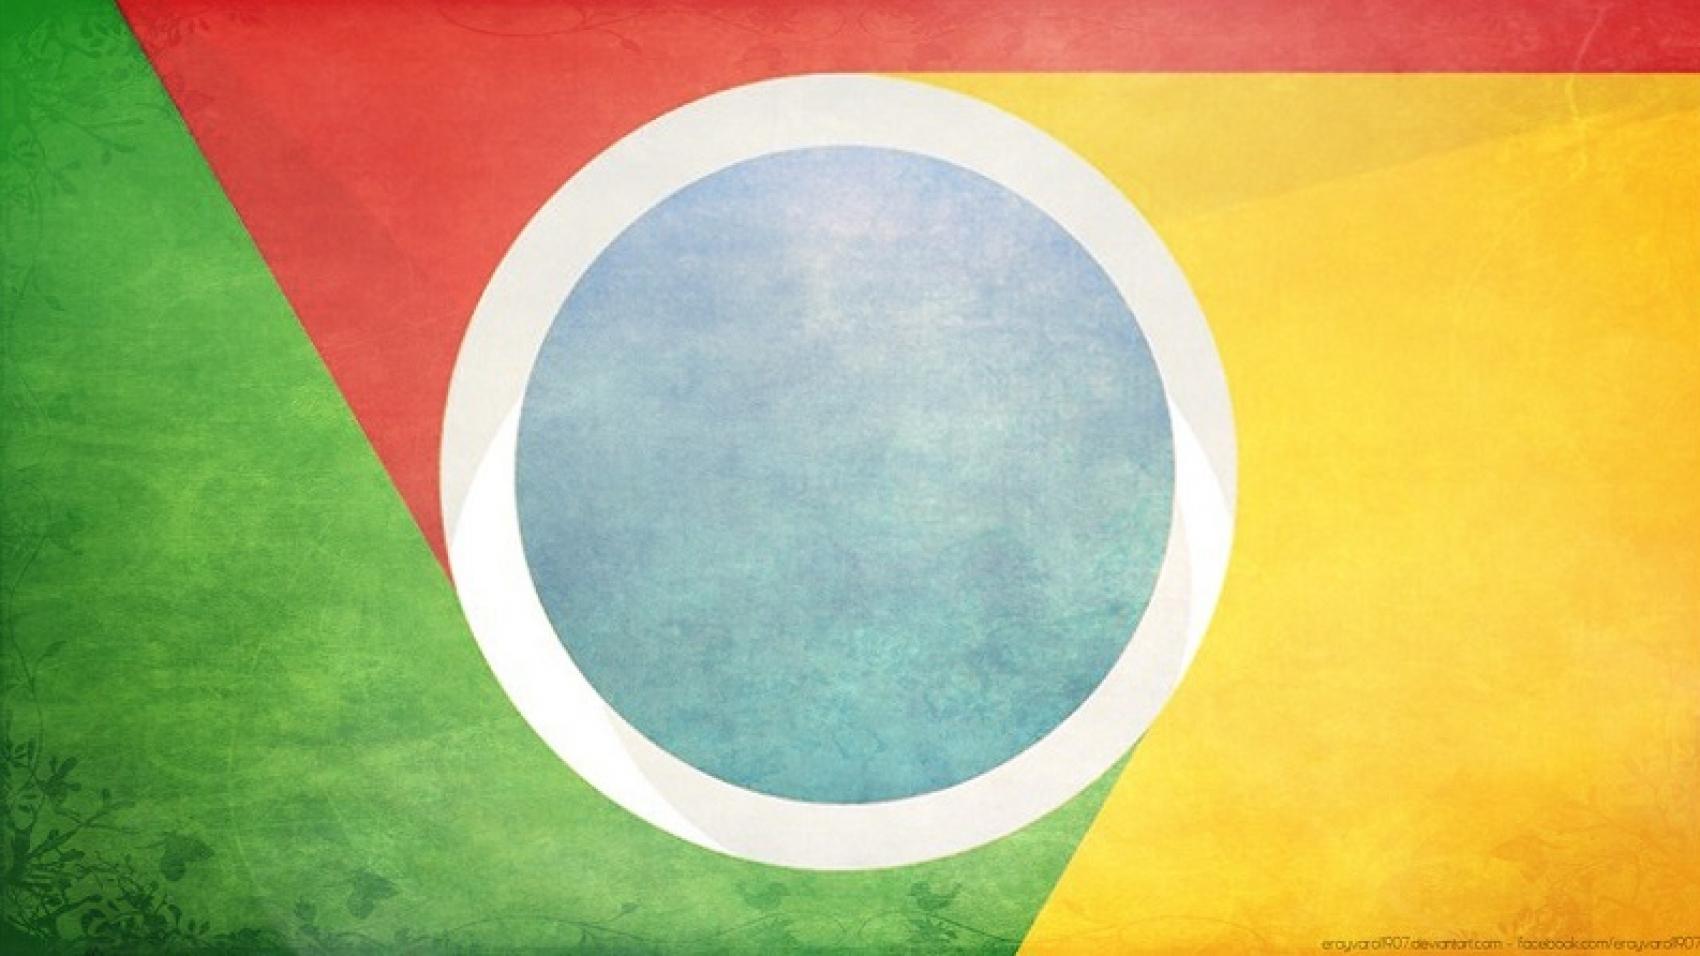 Chrome shortcut